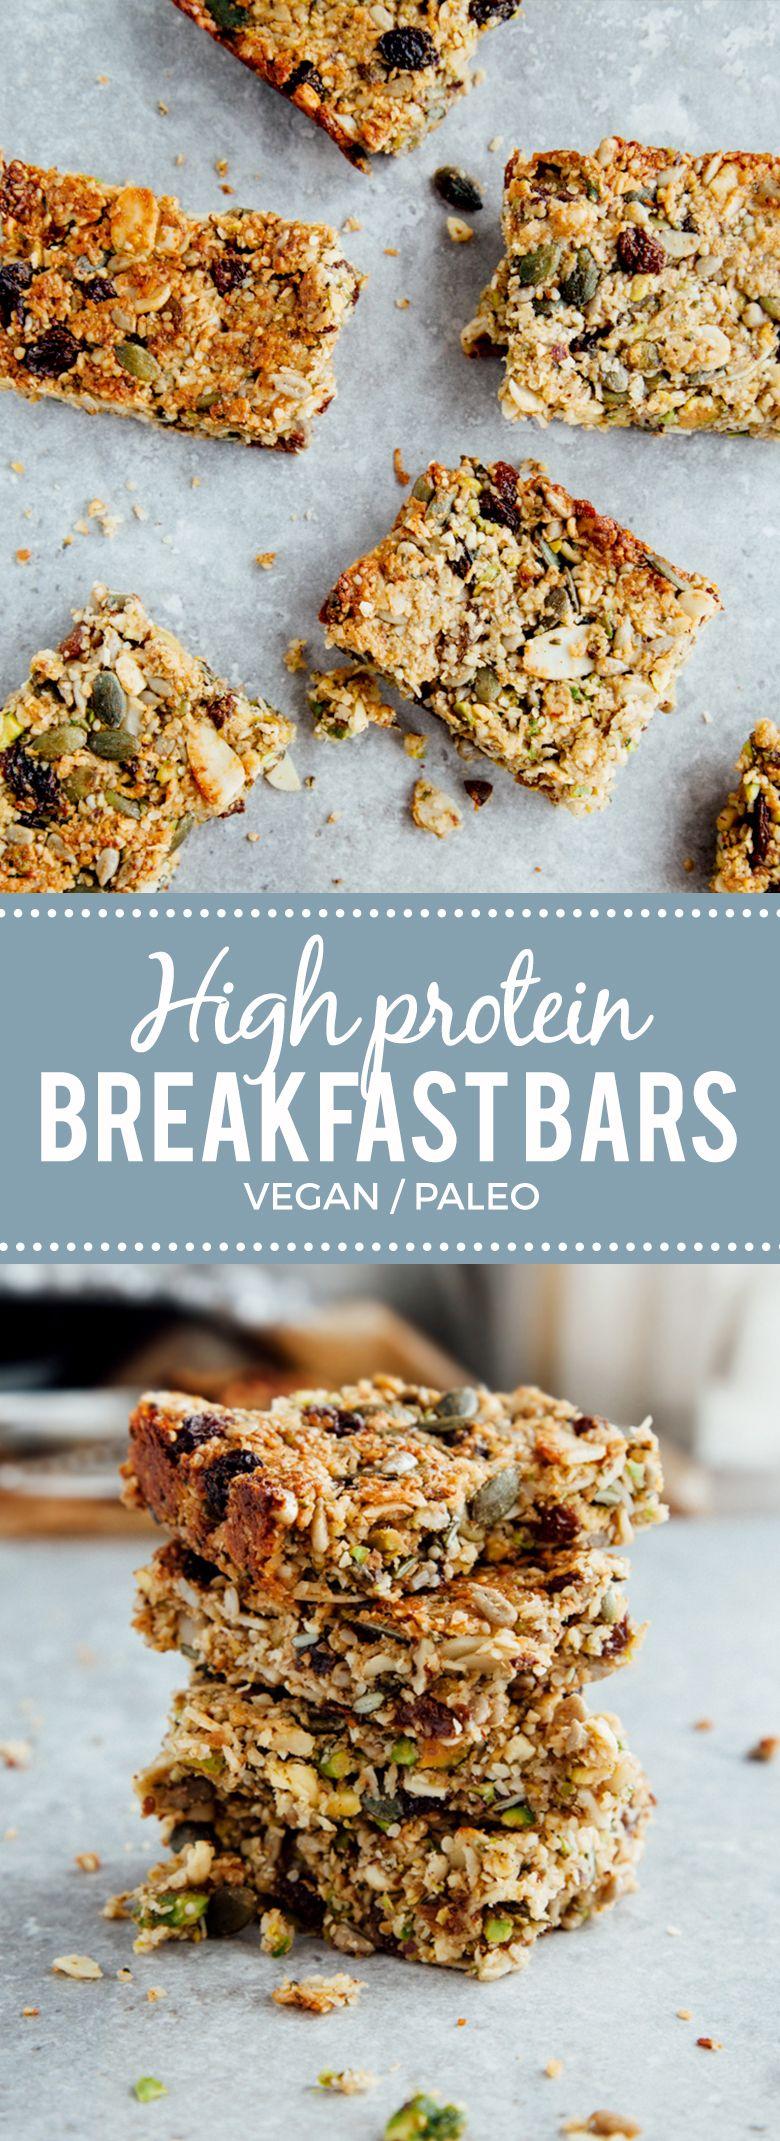 Protein Breakfast Bars Vegan Paleo Wallflower Kitchen Recipe Breakfast Bars Recipe Protein Breakfast Bars Protein Snacks